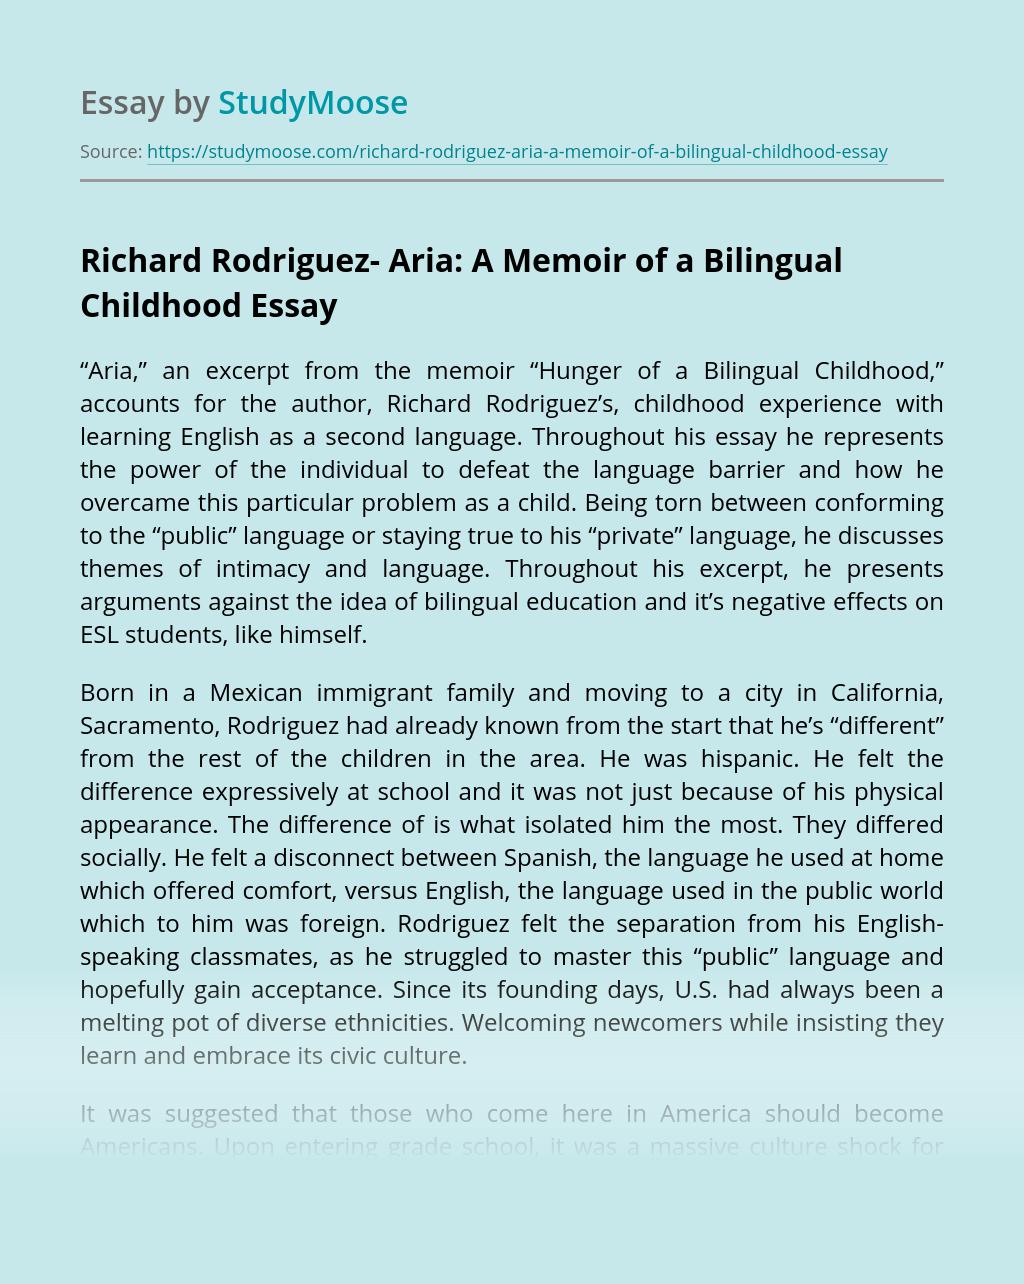 Richard Rodriguez- Aria: A Memoir of a Bilingual Childhood